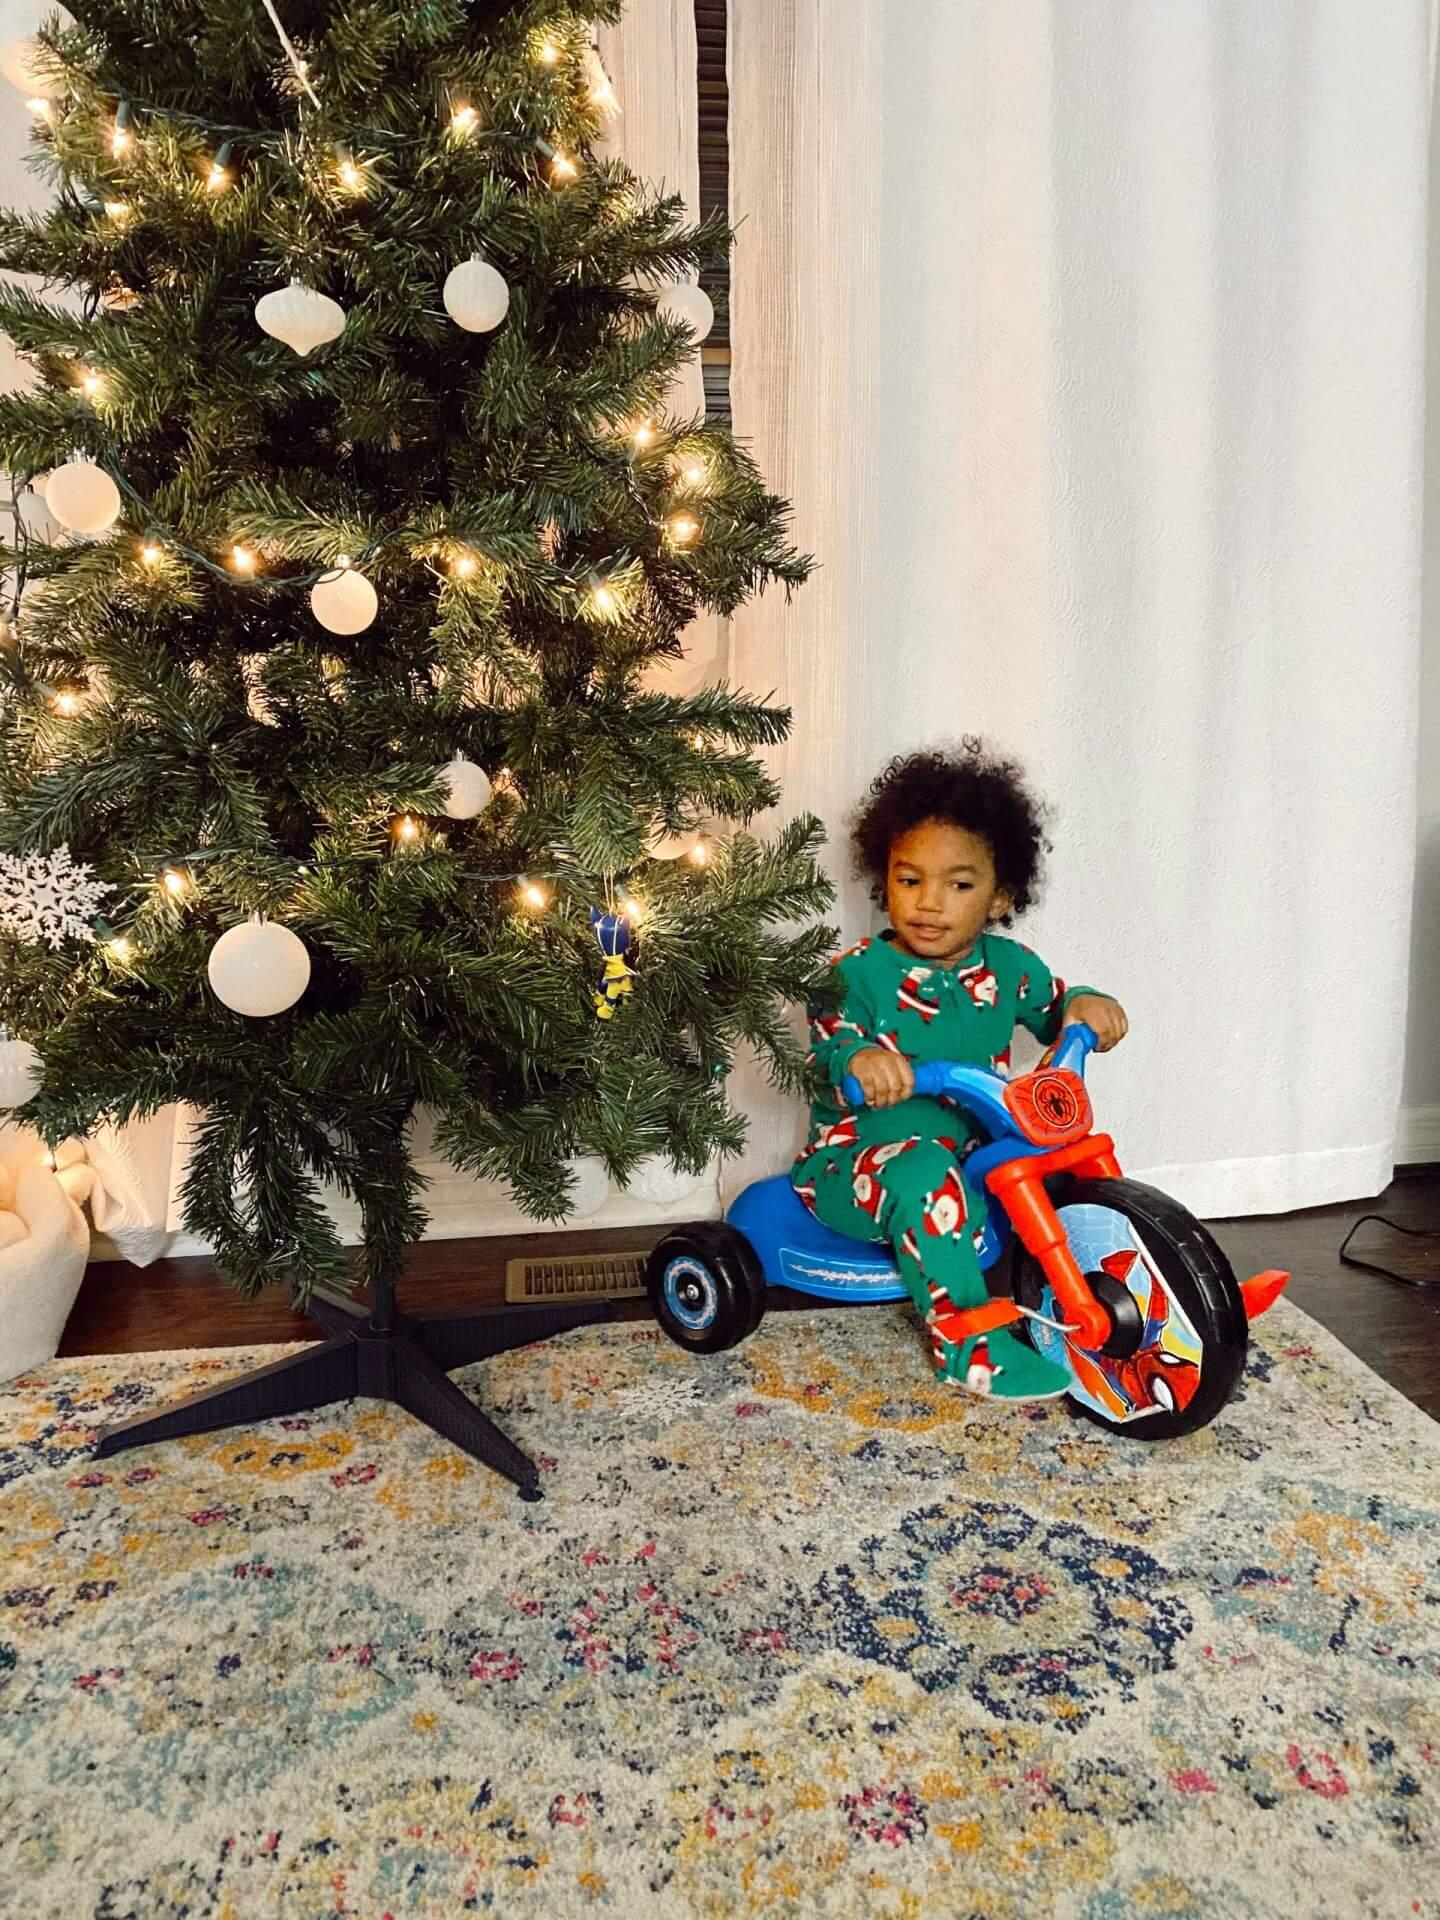 hello-brittnee-toddler-holiday-activities-fun